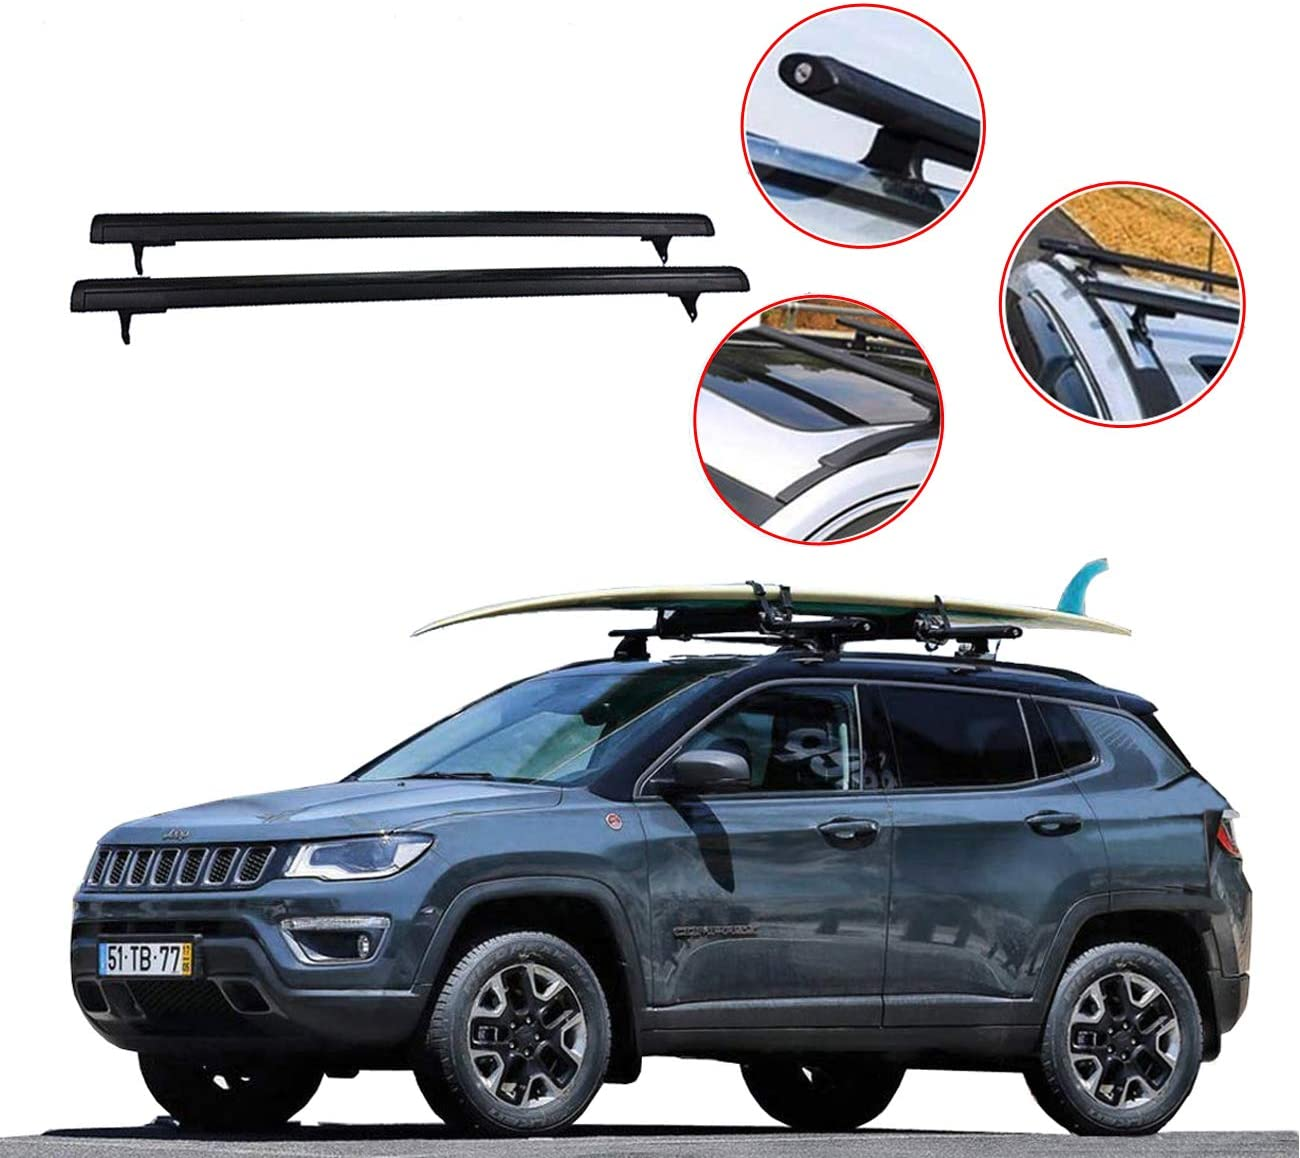 rokiotoex roof rack crossbars roof rail cross bars fit 2017 2018 2019 2020 2021 jeep compass rooftop side rails cargo bag kayak luggage carriers